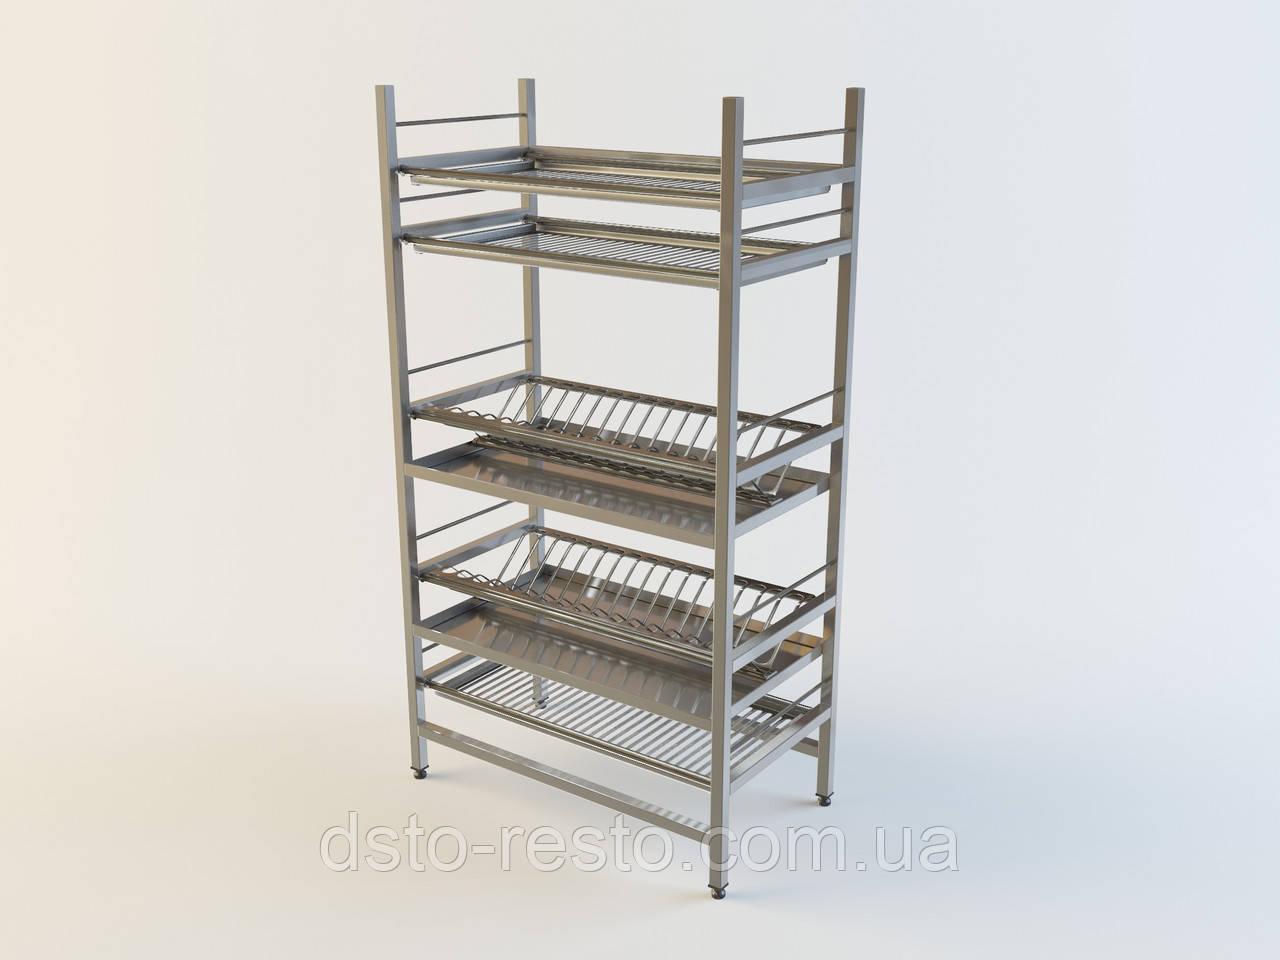 Стеллажи для сушки посуды 600/320/1650 мм